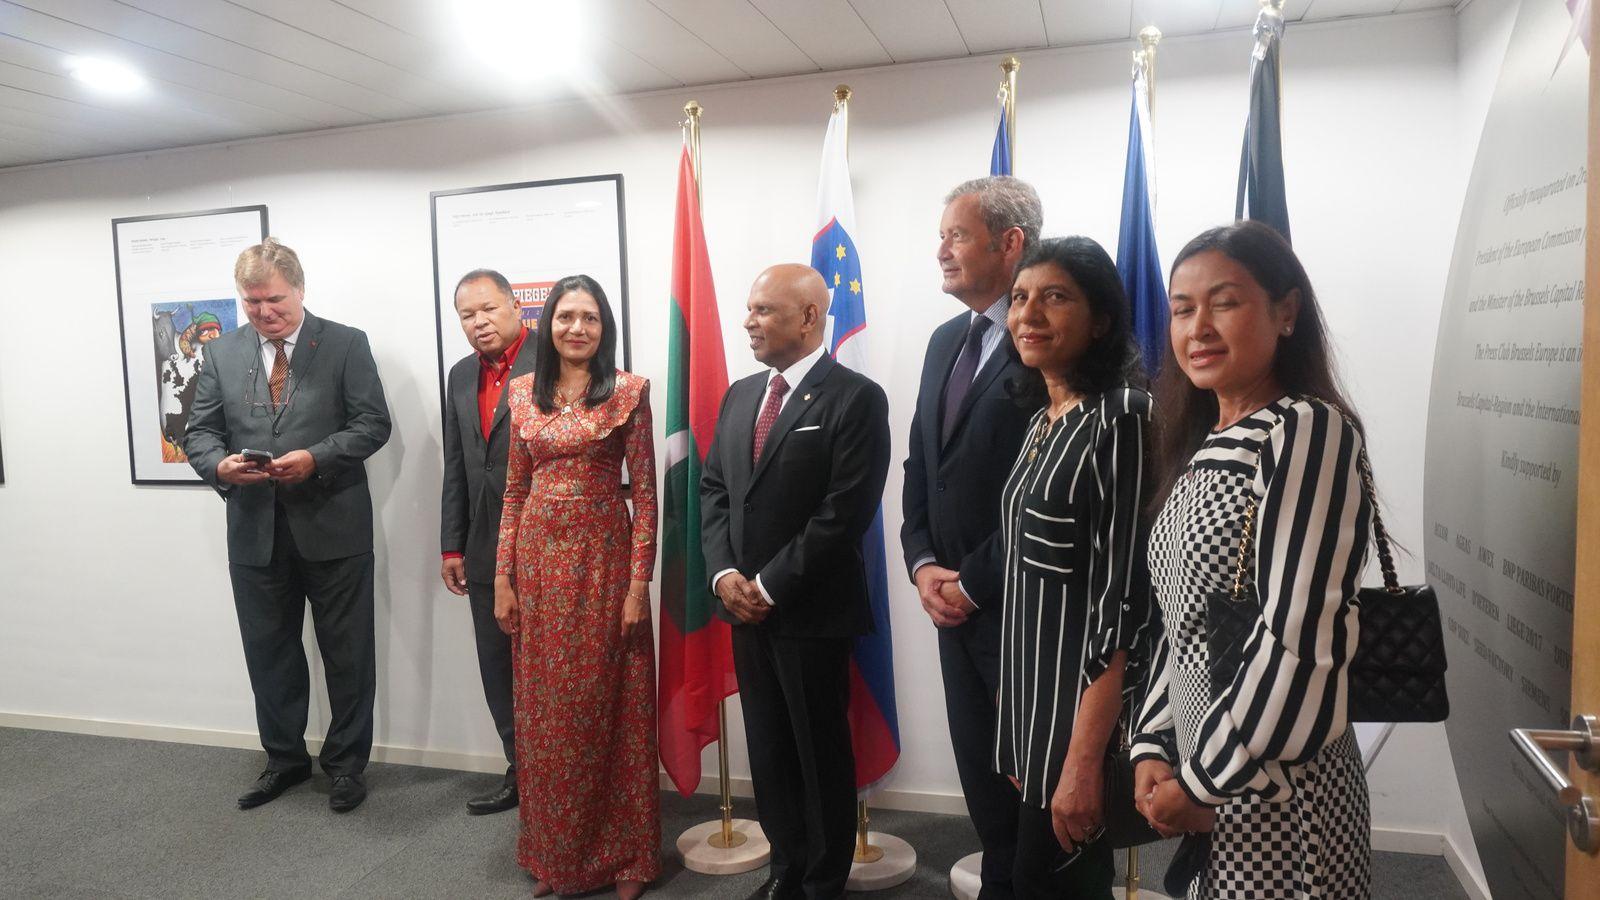 Copyright hafidabenyacoub : Ambassador and his wife, Ms. Mariyam Seena - Counsellor  Ms. Fathimath Reena - First Secretary  Ms. Nektaria Margaroni - European and Commercial Affairs Consultant